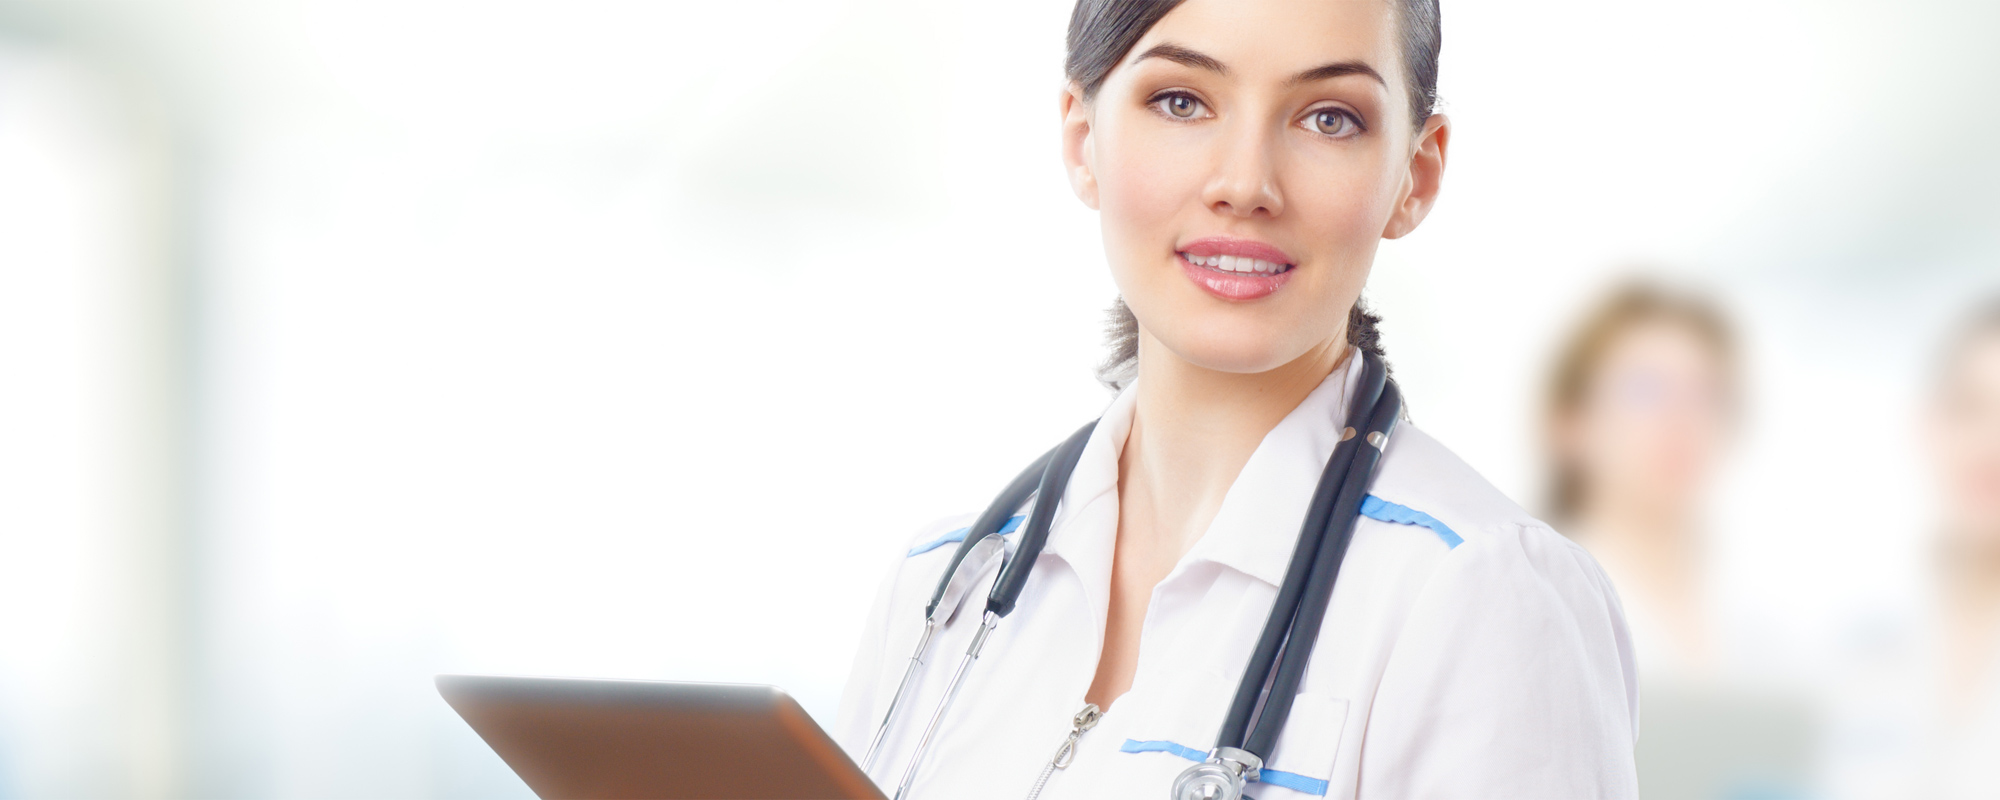 oferujemy <span> pacjentom </span> profesjonalną <span>opiekę medyczną</span>